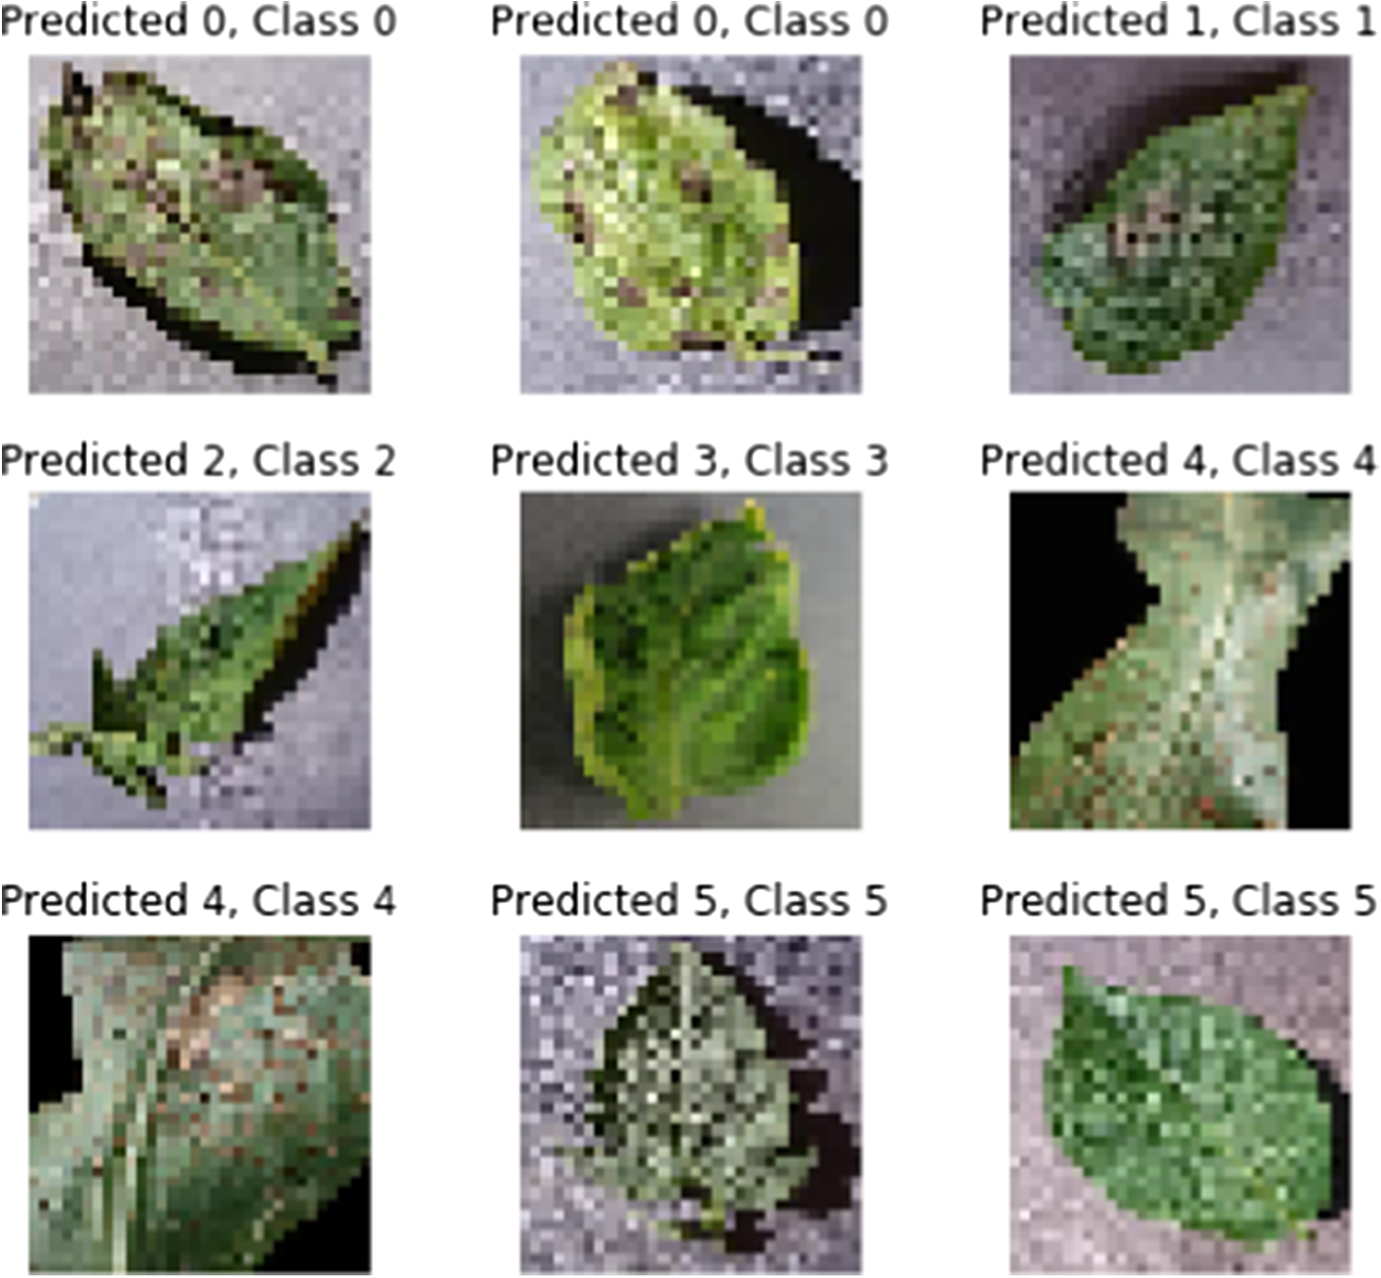 Seasonal Crops Disease Prediction and Classification Using